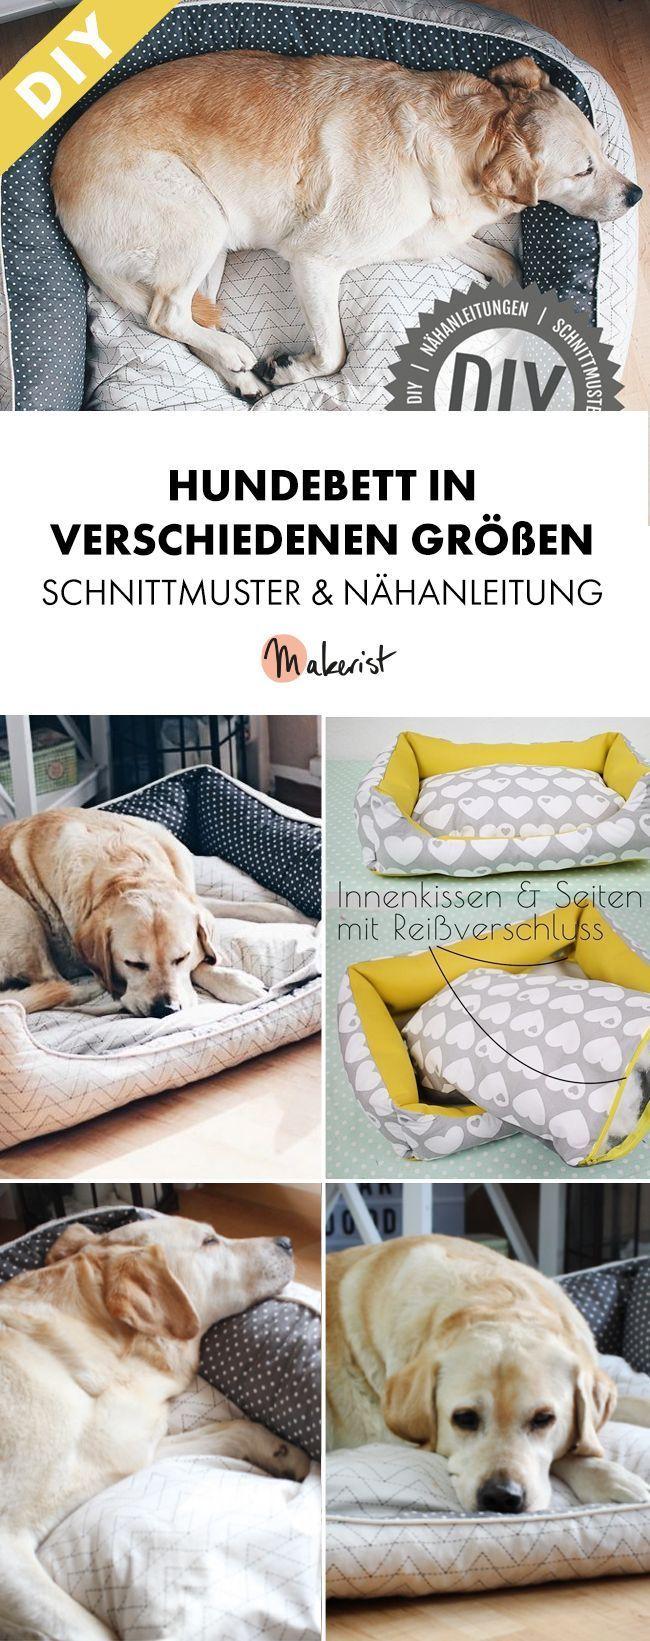 Nähanleitung Hundebett in 3 Größen mit Reißverschluss | Pinterest ...